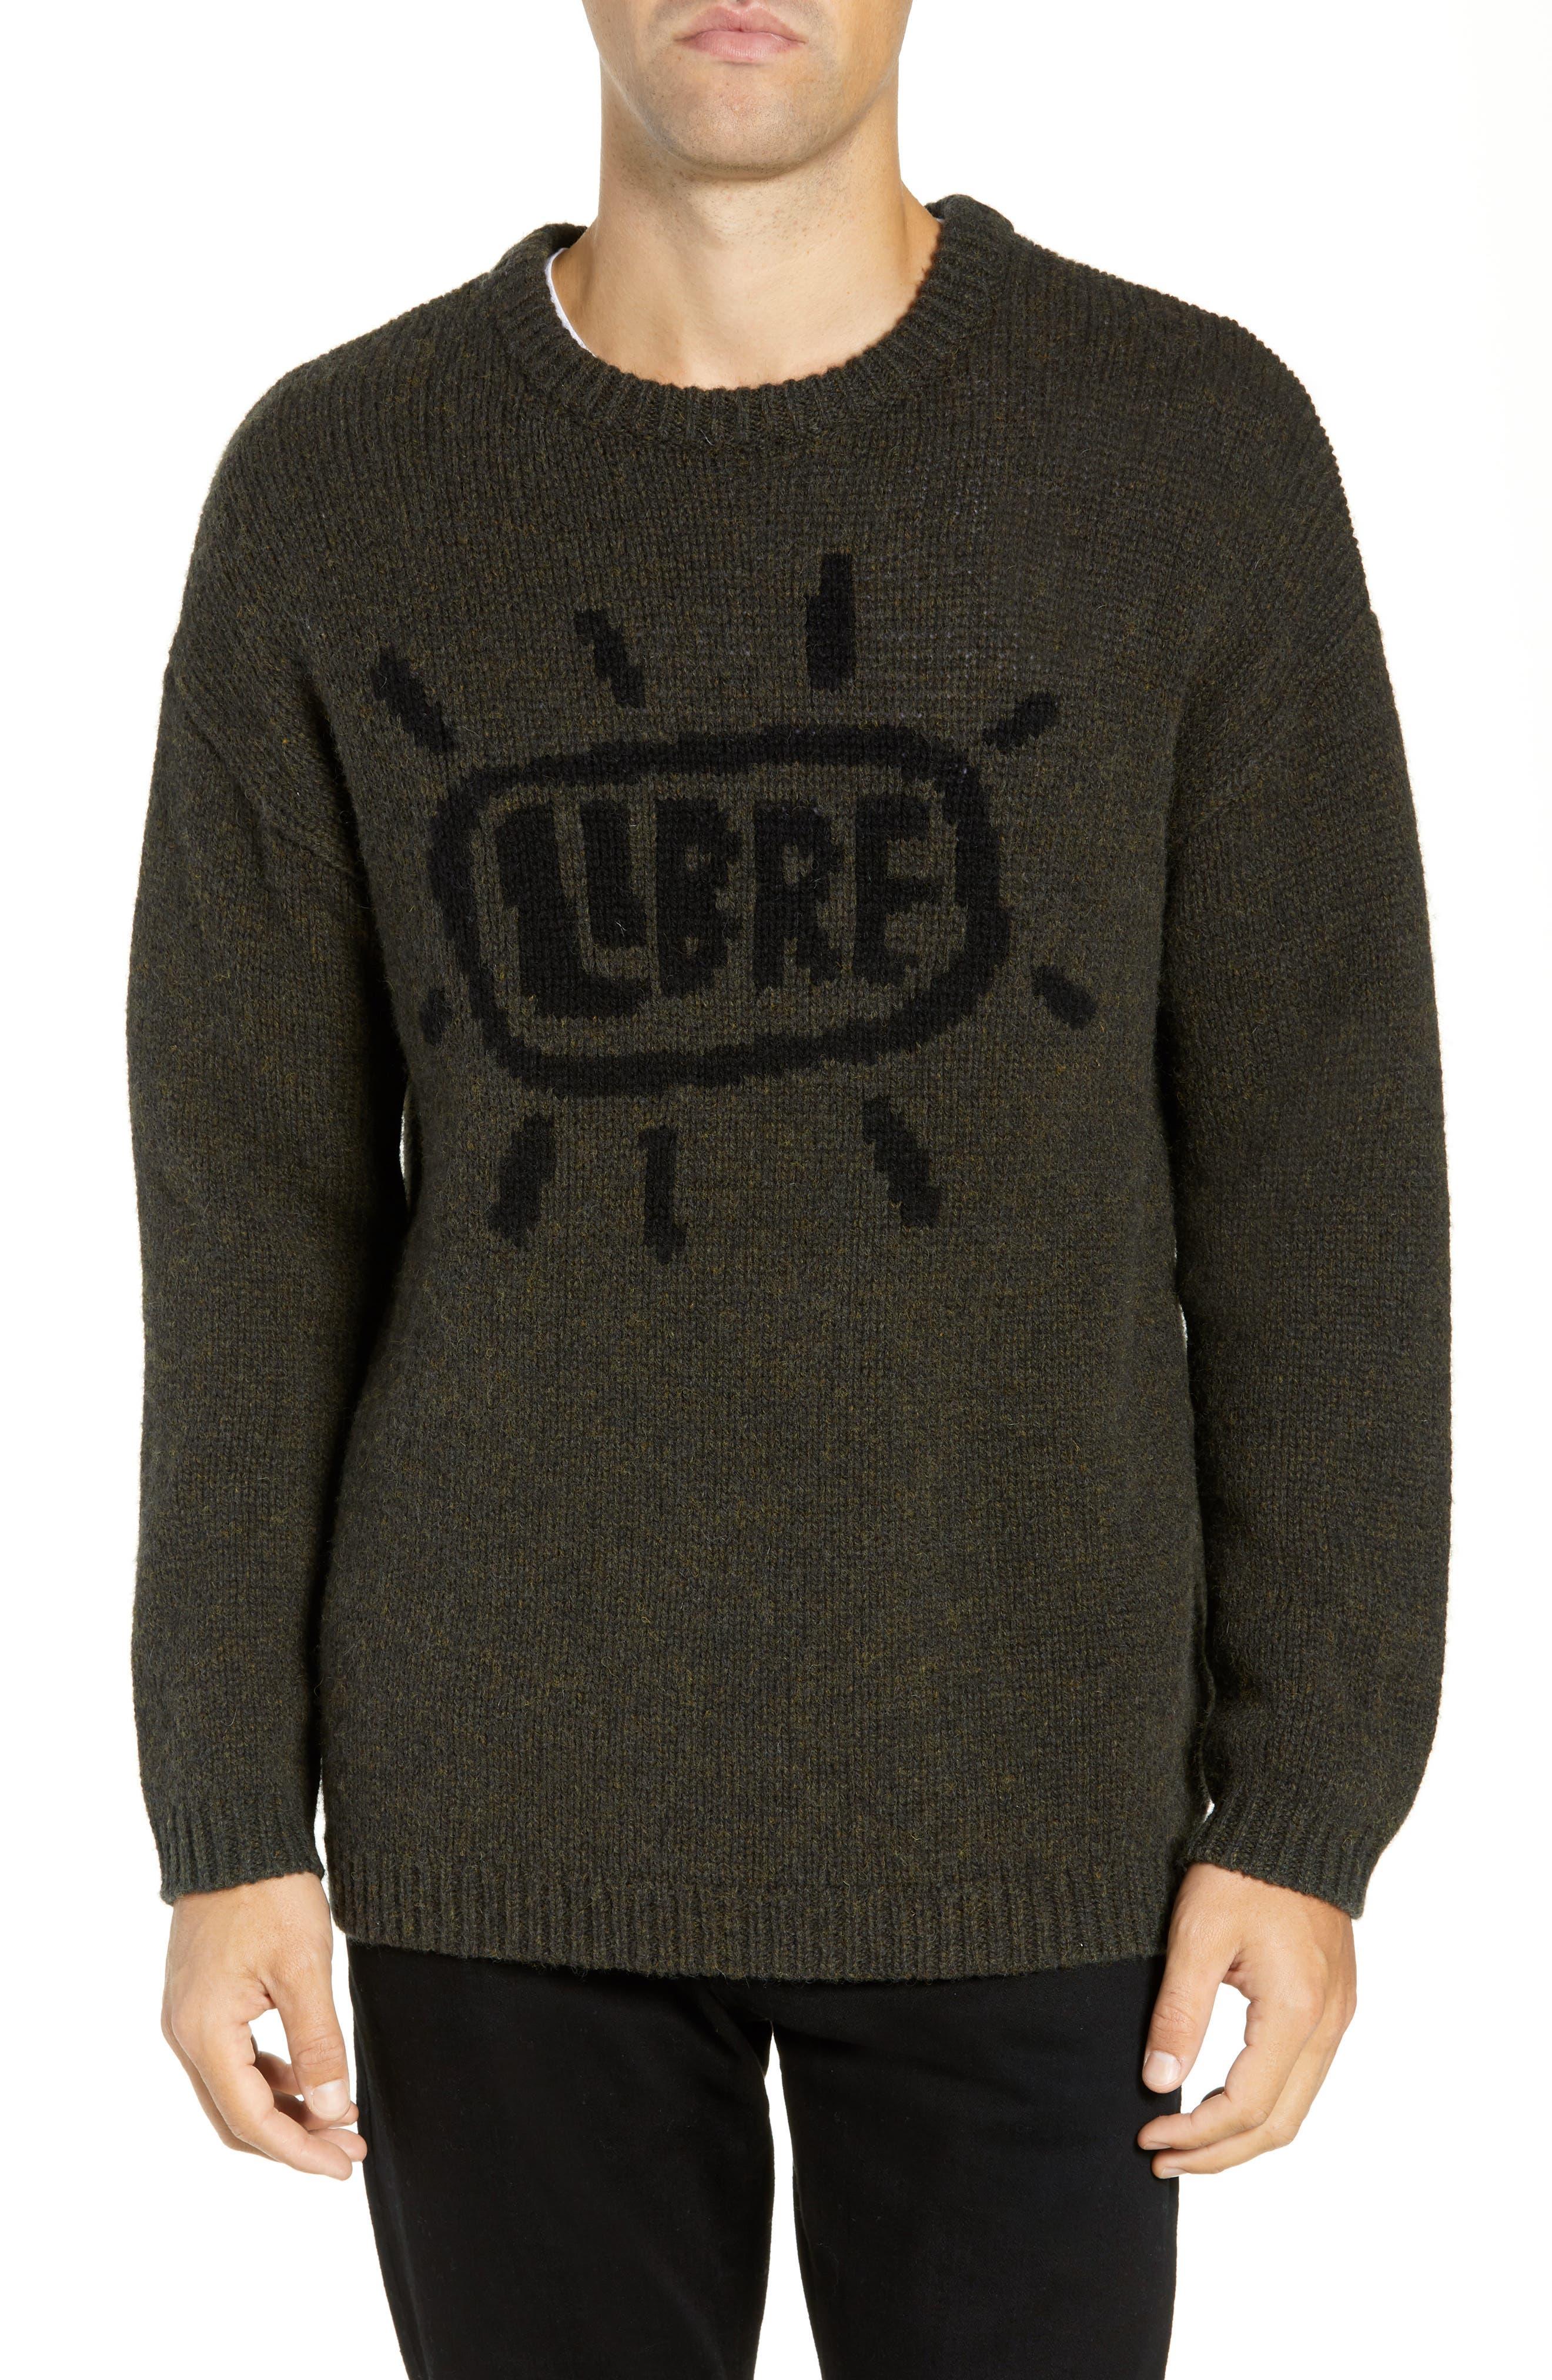 Free Regular Fit Shetland Wool Sweater,                             Main thumbnail 1, color,                             MIDNIGHT MOSS BLACK